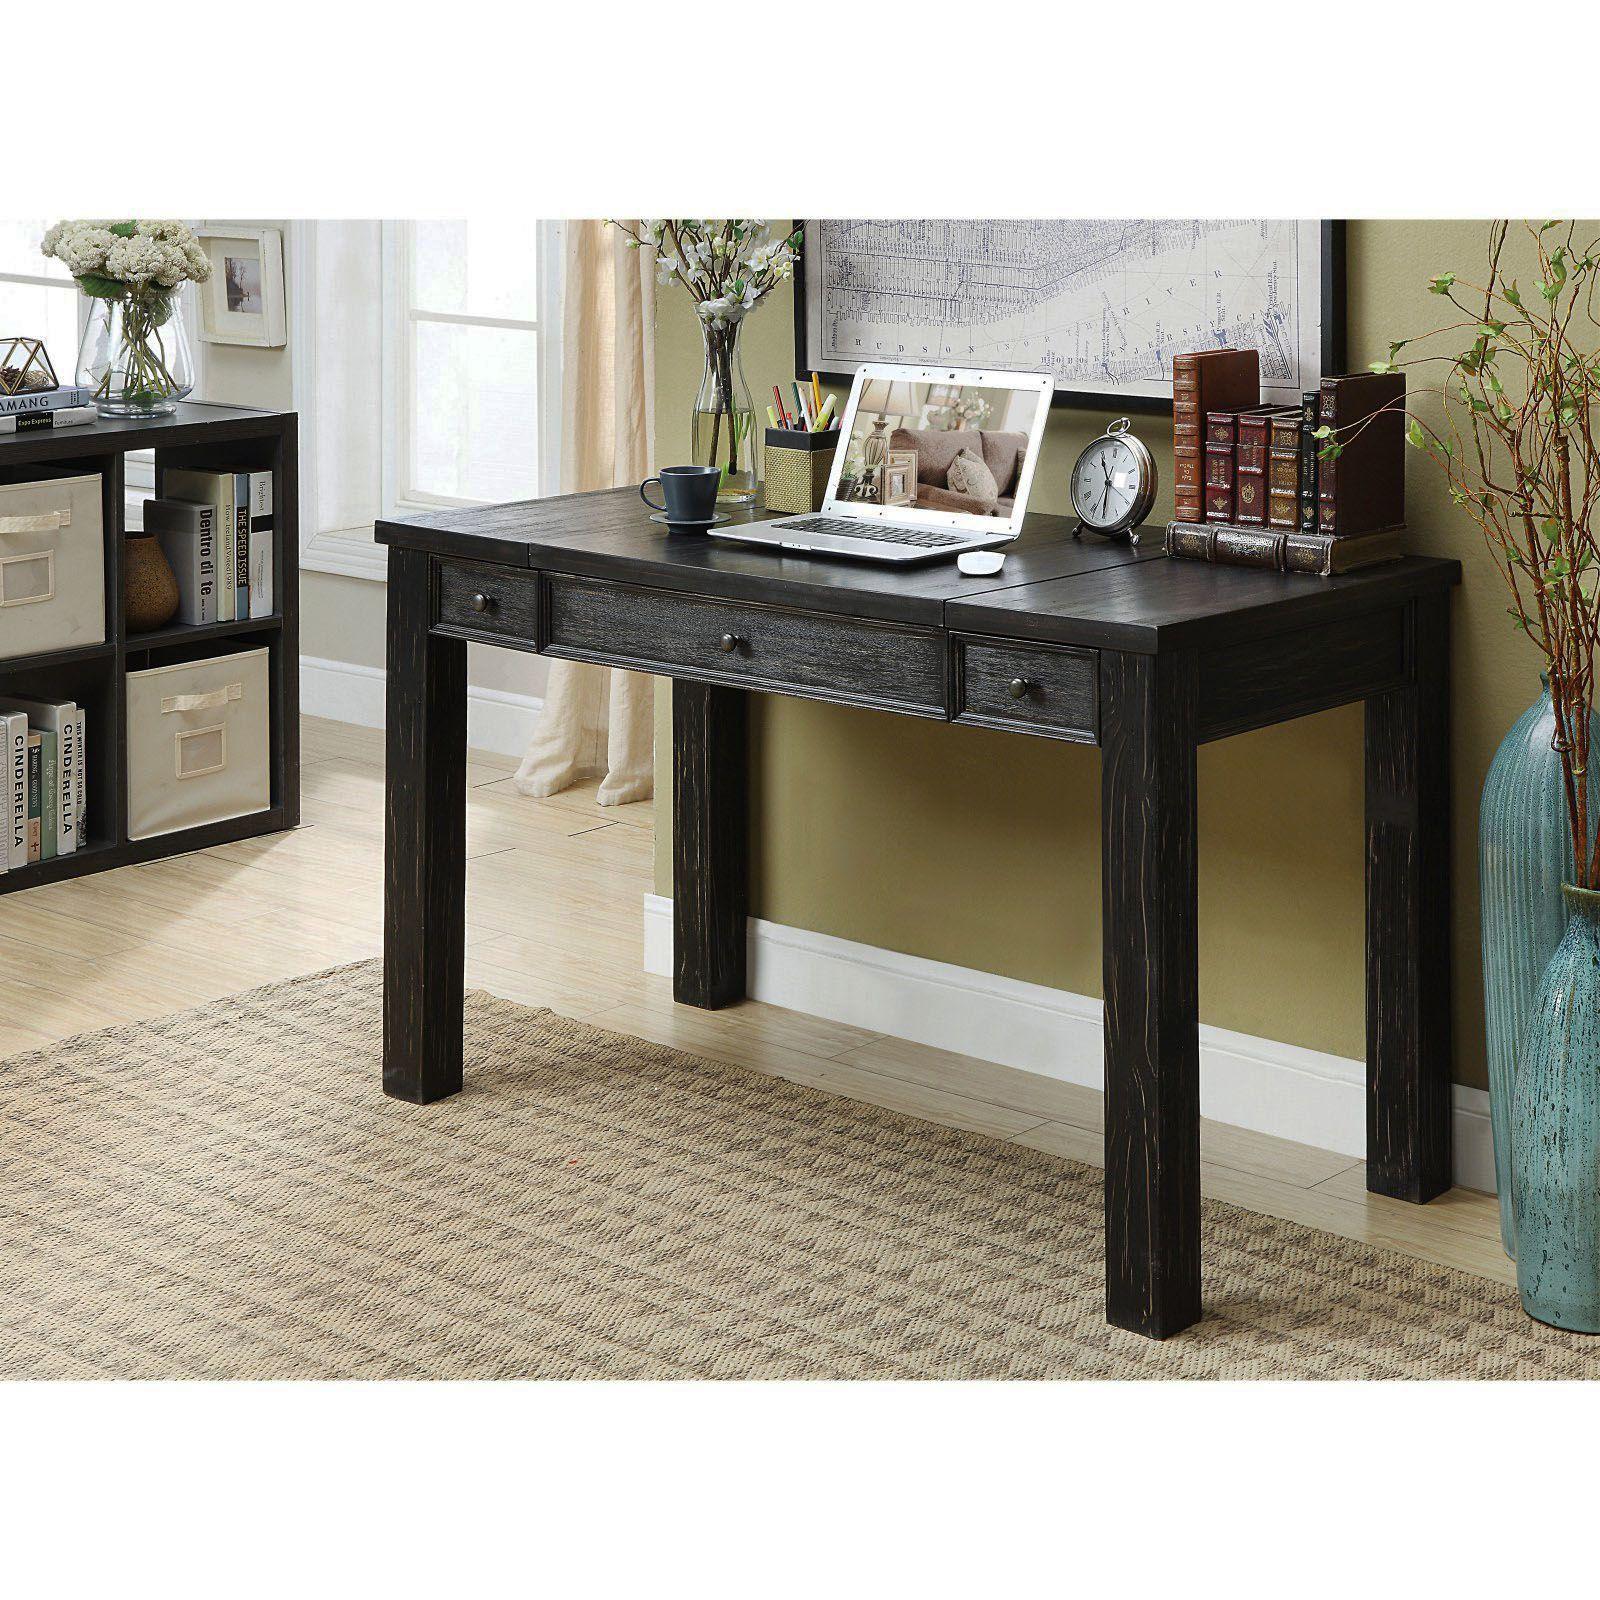 Superb Black Desk Legs For Your Cozy Home Rustic Writing Desk